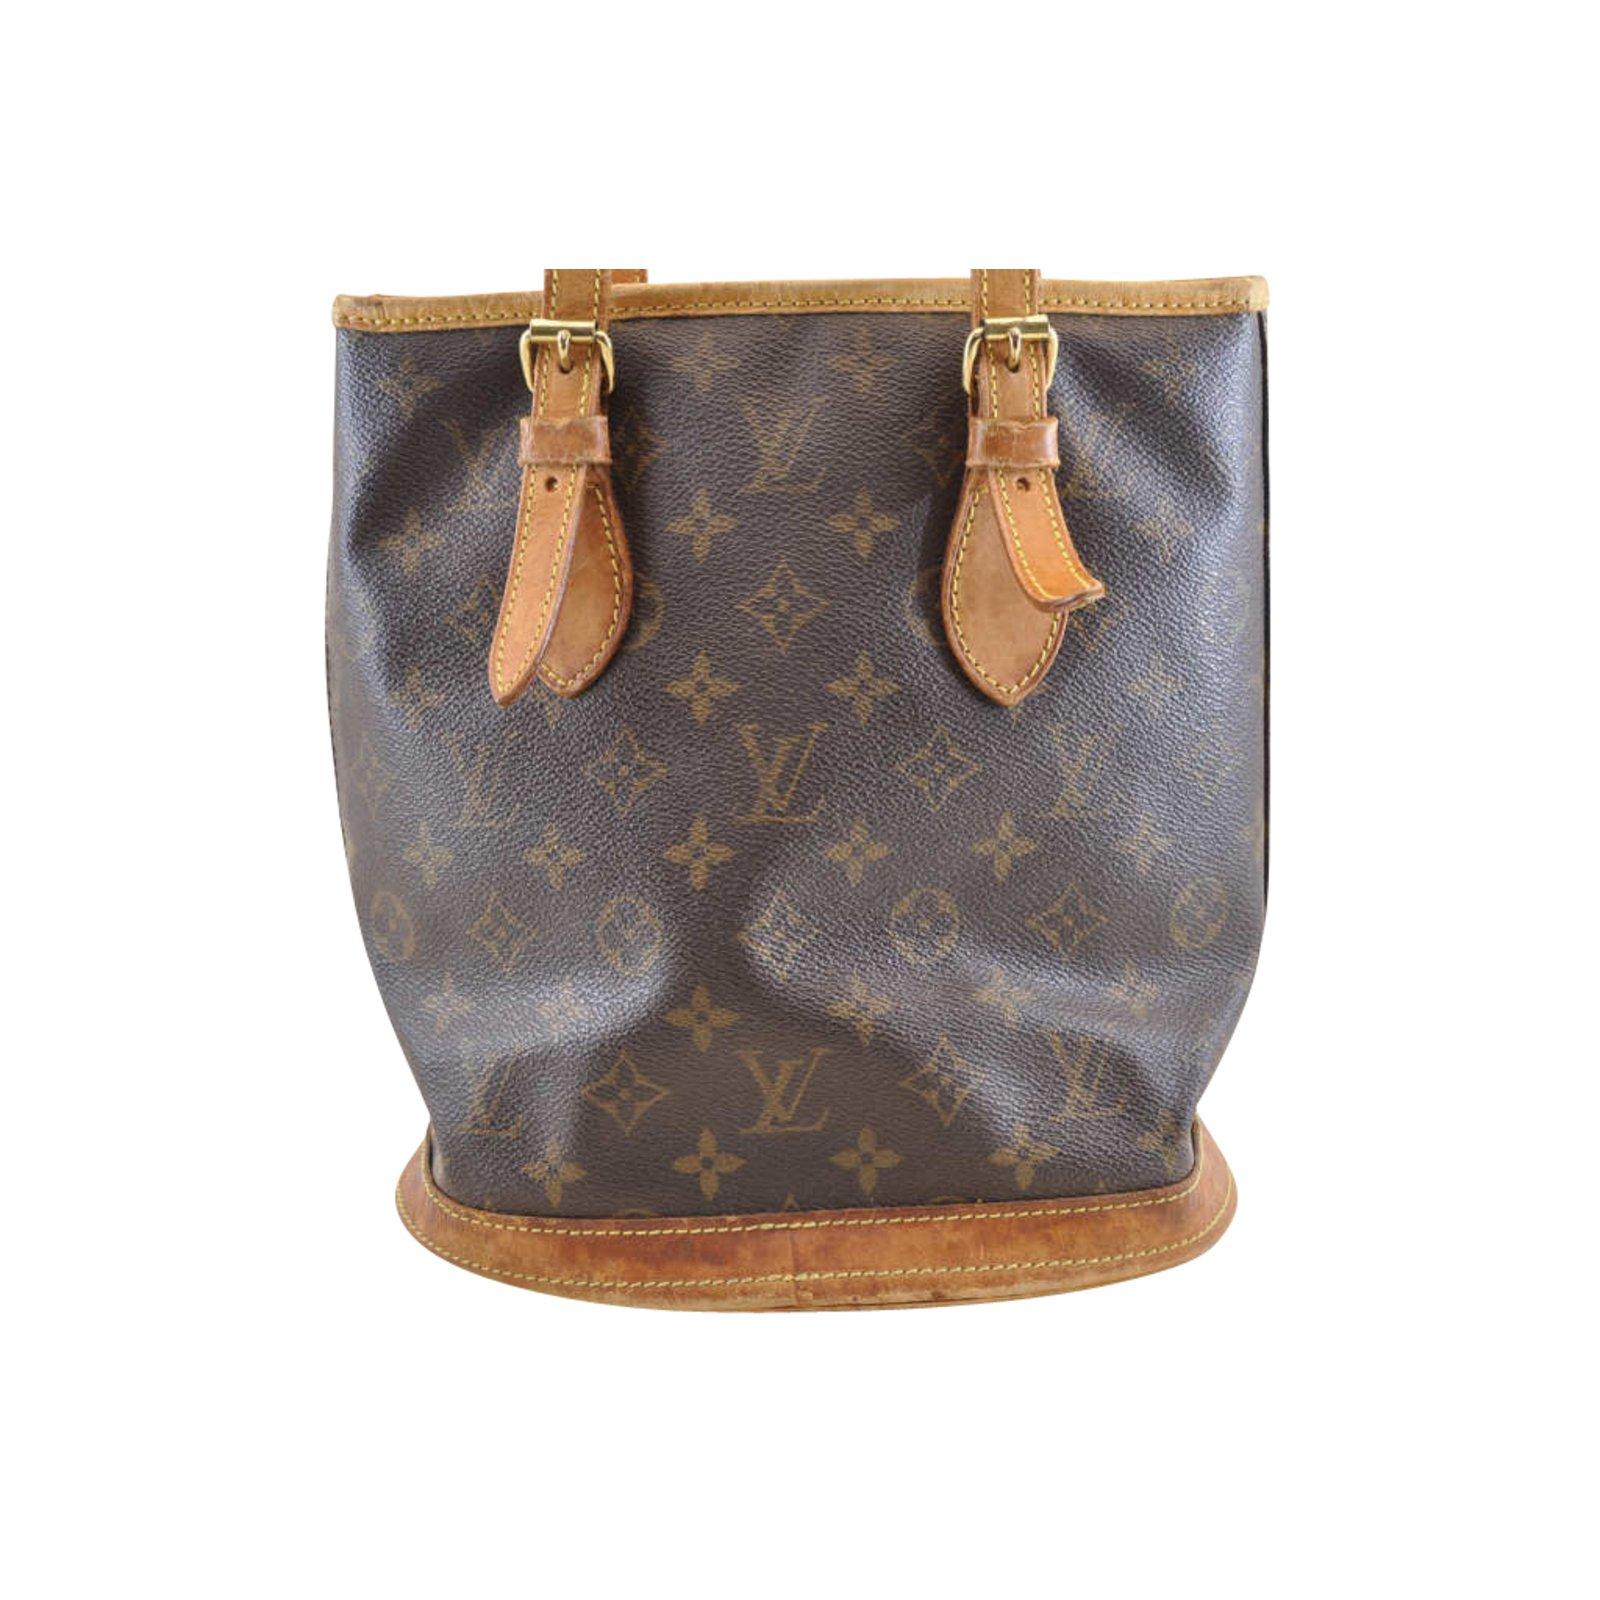 2c688d9c4985 Louis Vuitton Louis Vuitton Monogram Bucket PM Handbags Cloth Brown ...